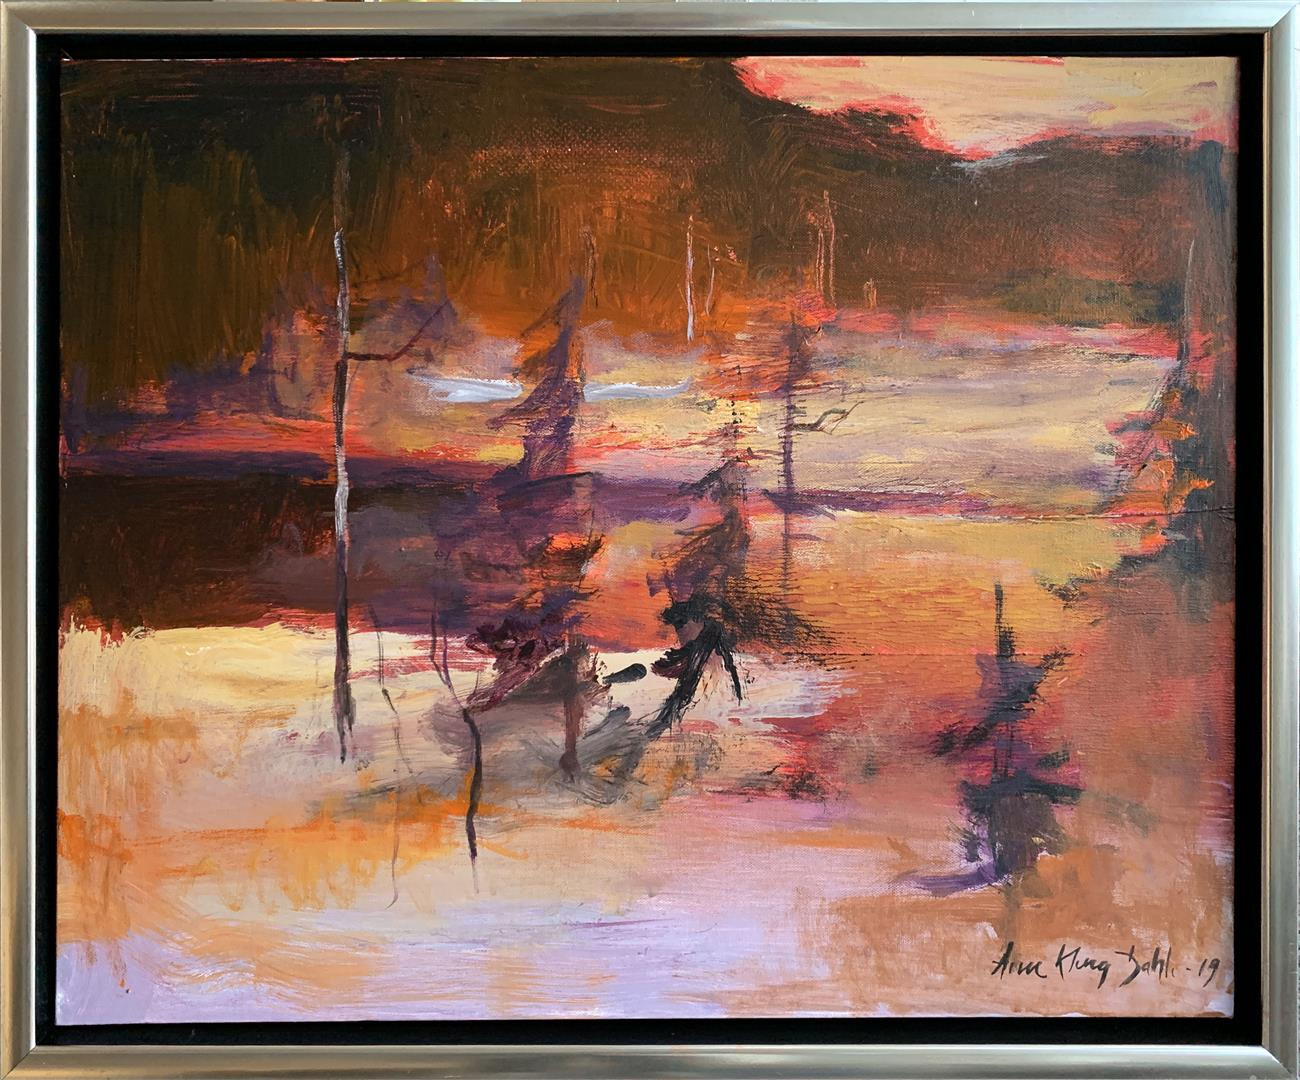 Arne Kleng Dahle: Tjernet Akrylmaleri (50x60 cm) kr 6000 mr